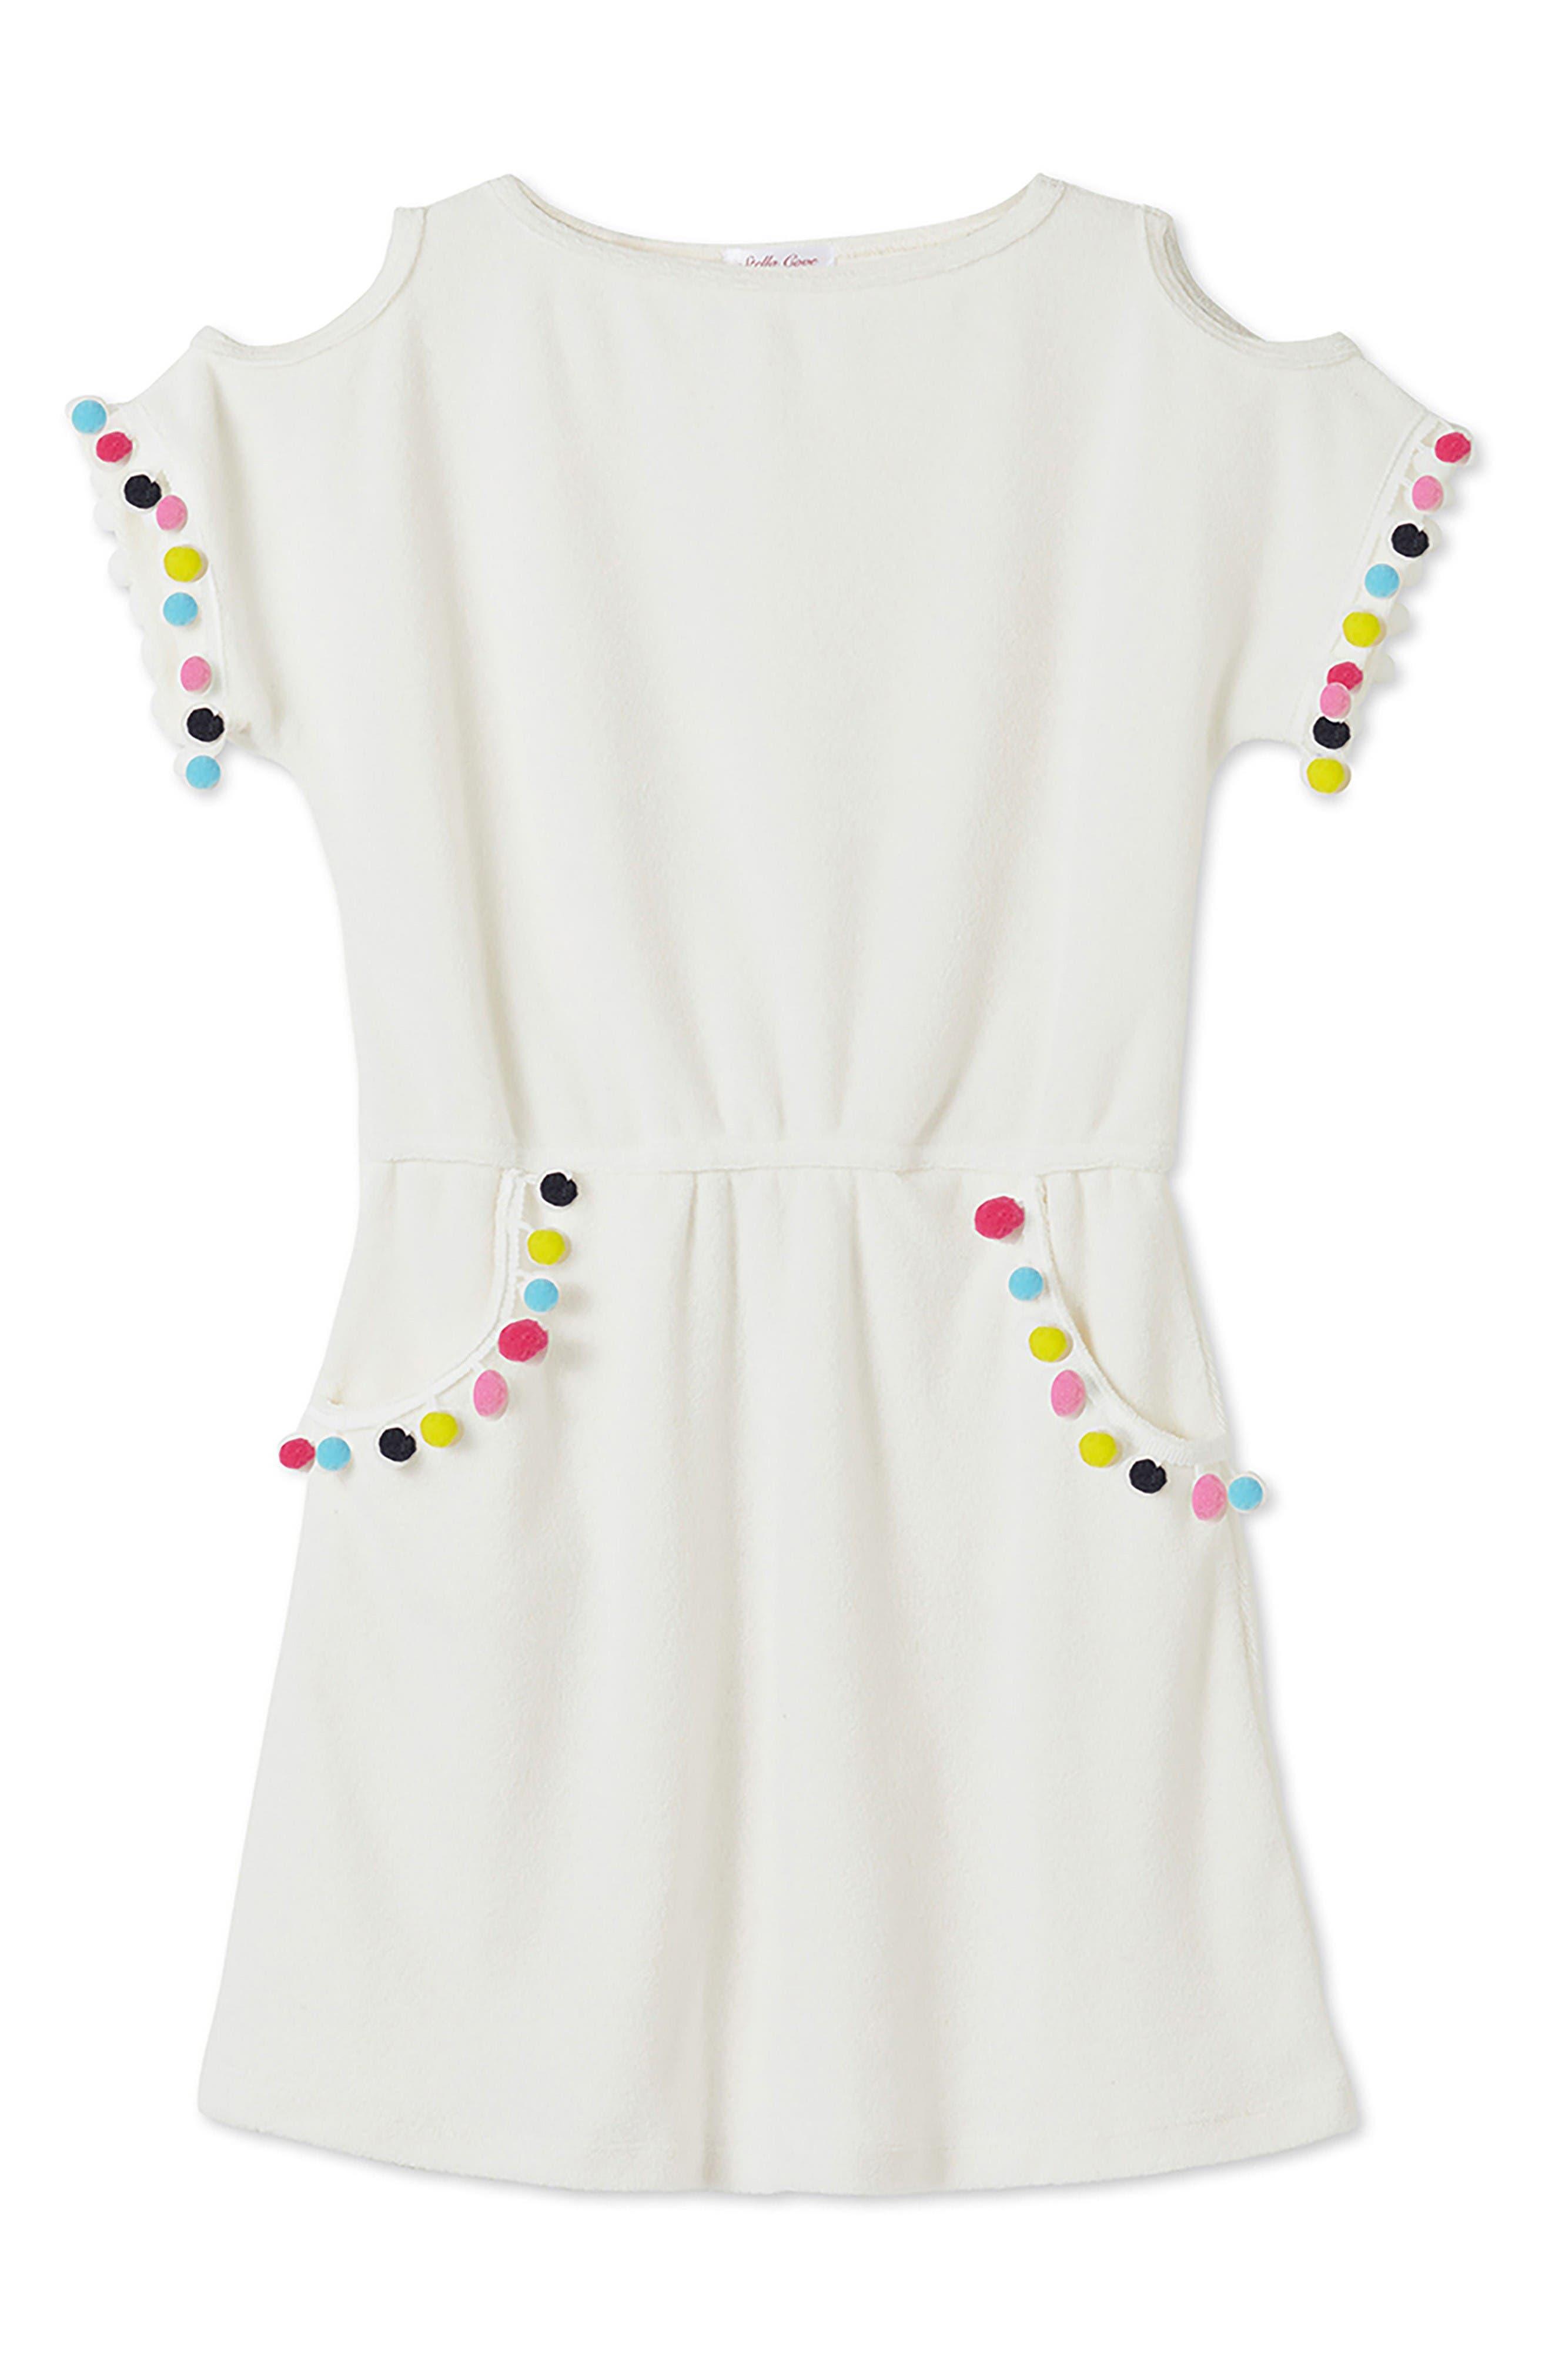 Alternate Image 1 Selected - Stella Cove Pompom Dress (Toddler Girls, Little Girls & Big Girls)